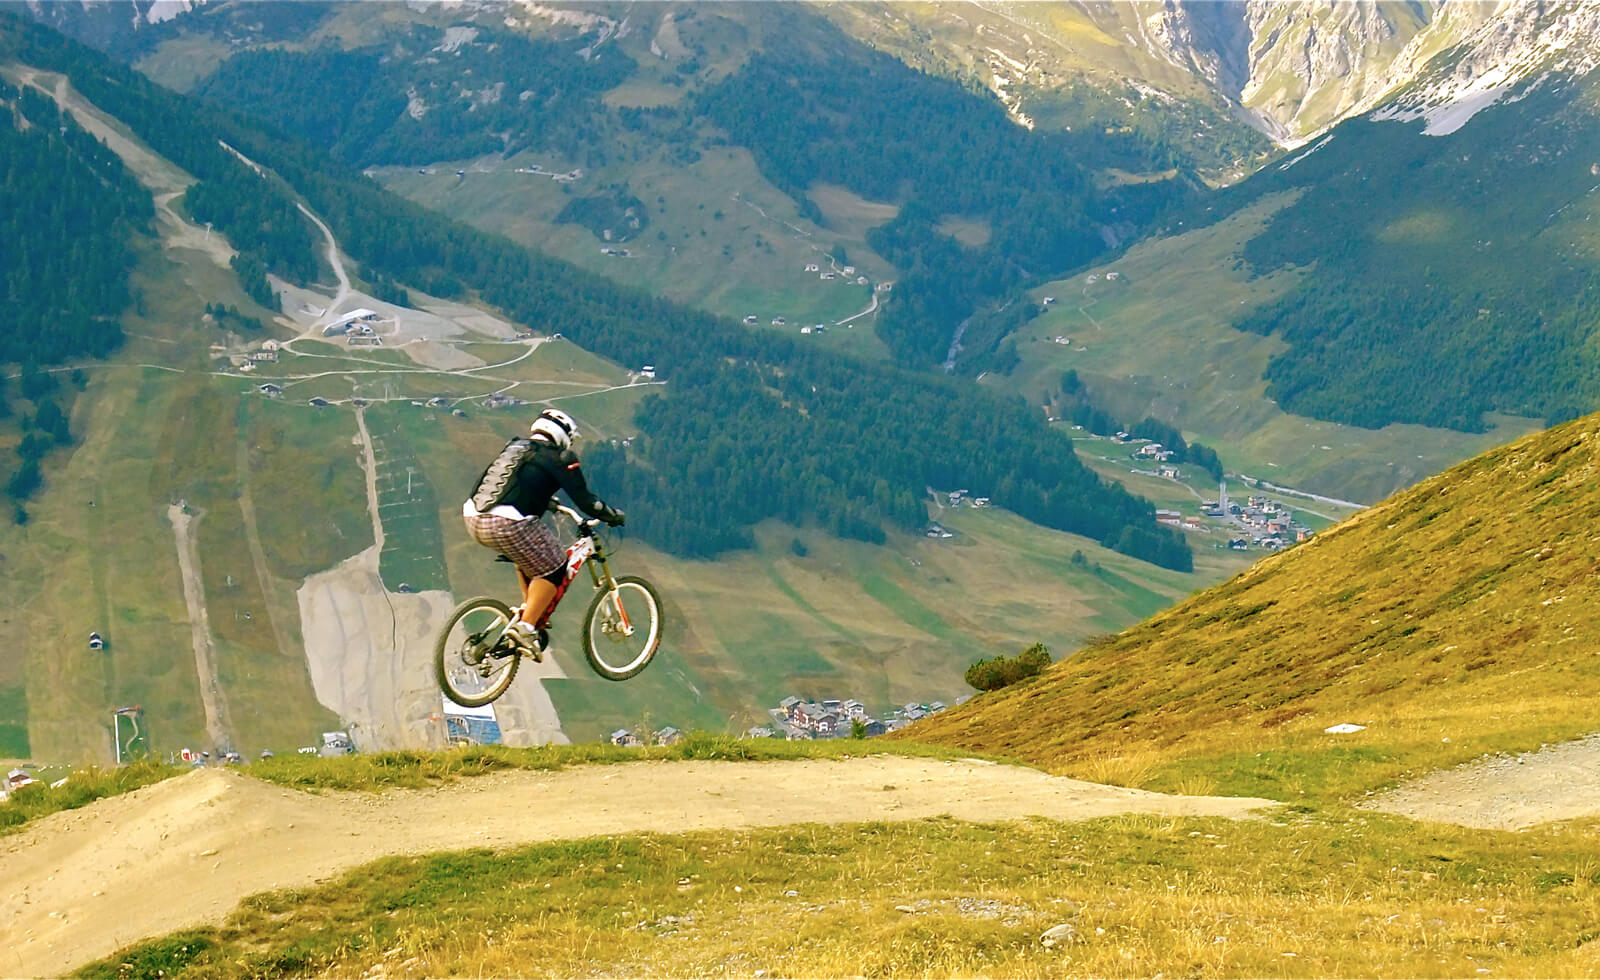 Downhill Biking in Switzerland